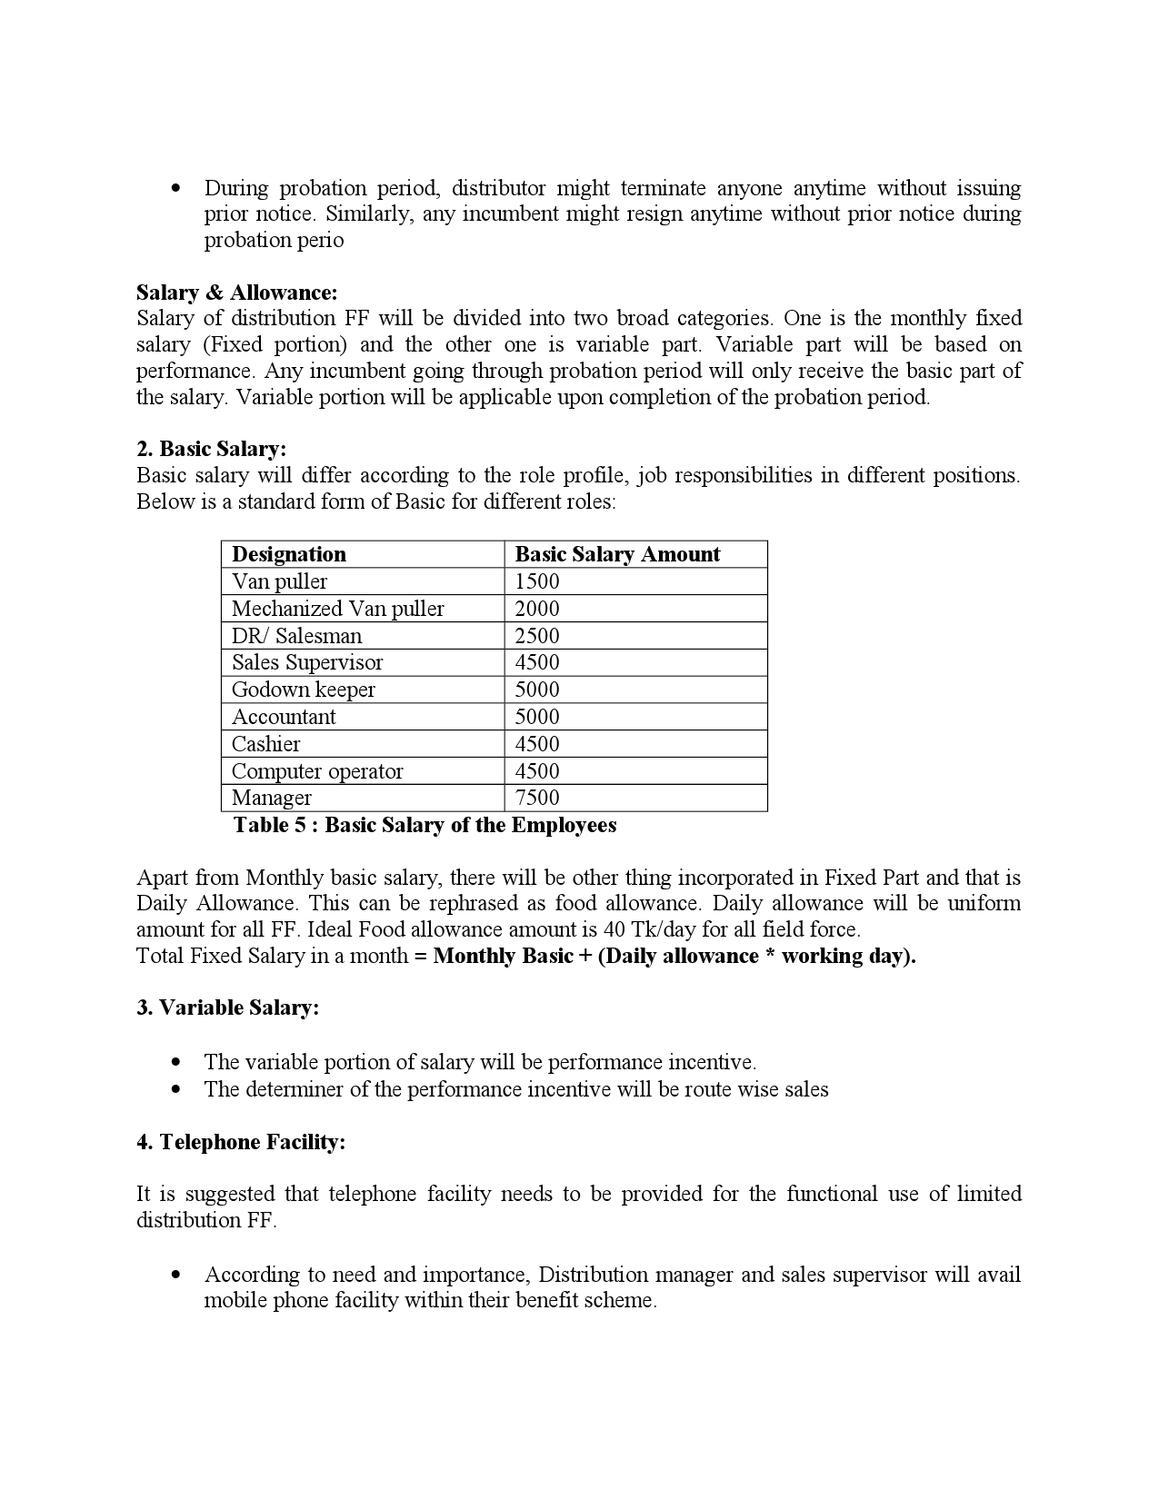 british american tobacco report by regan ahmed - issuu